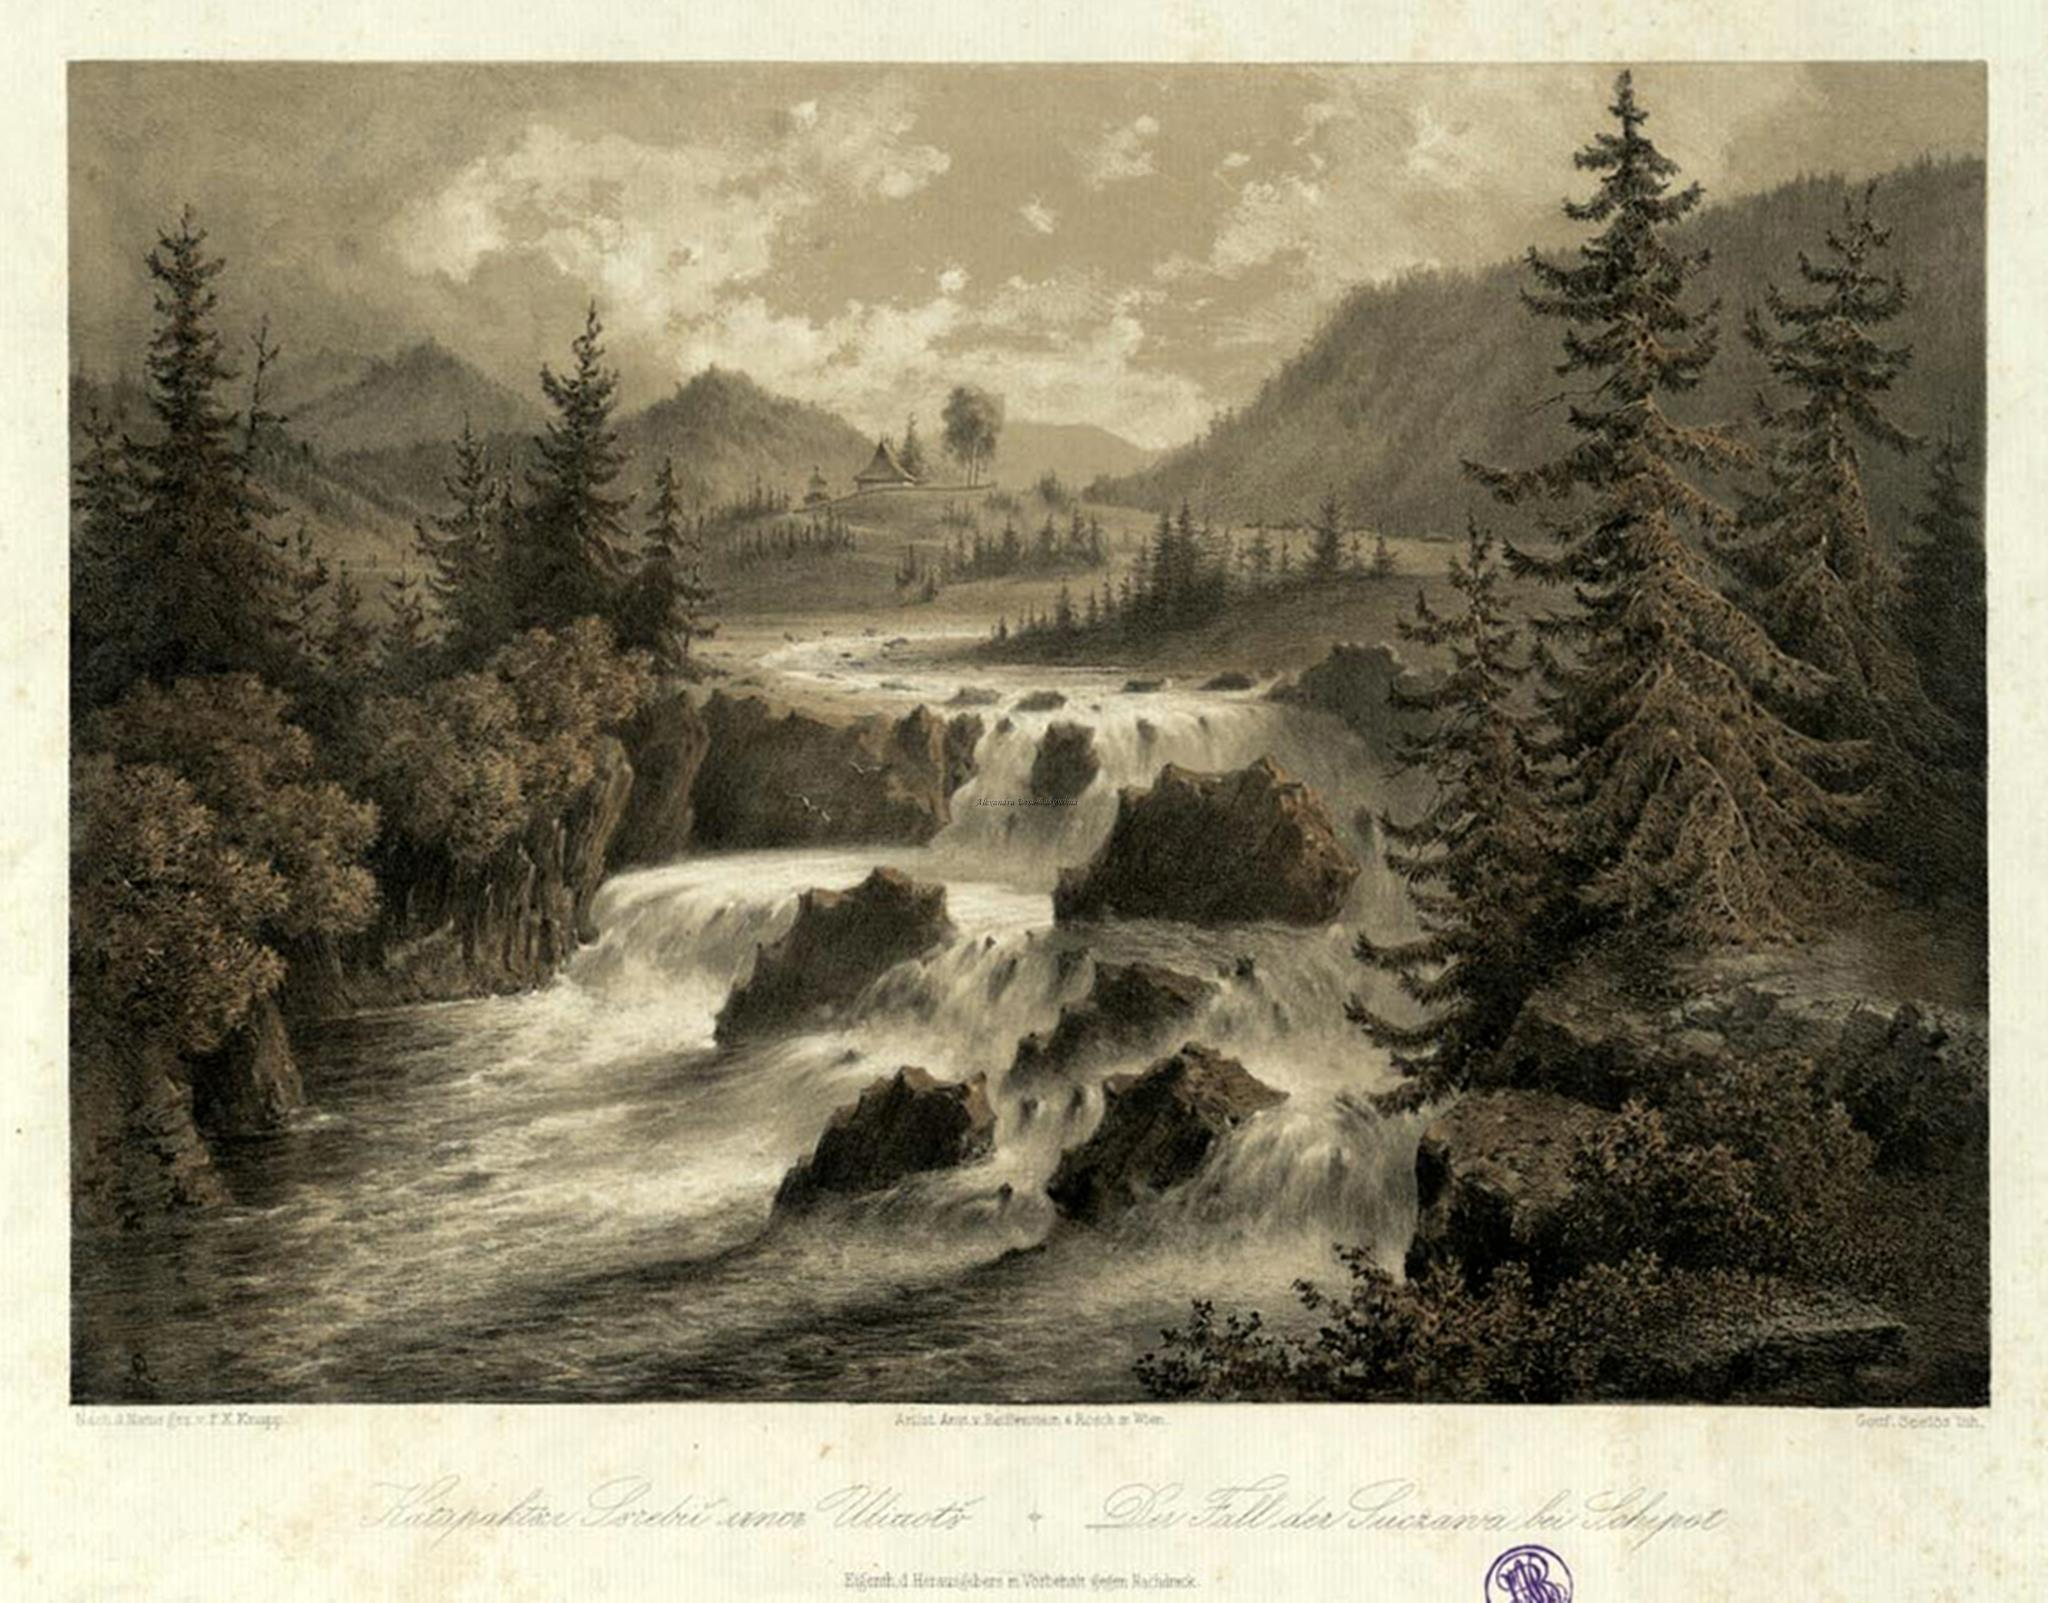 Oameni si locuri din Bucovina. Cataractul Sucevii langa Sipotu. Der Fall der Suczawa bei Schipot. 1870. F. X. Knapp